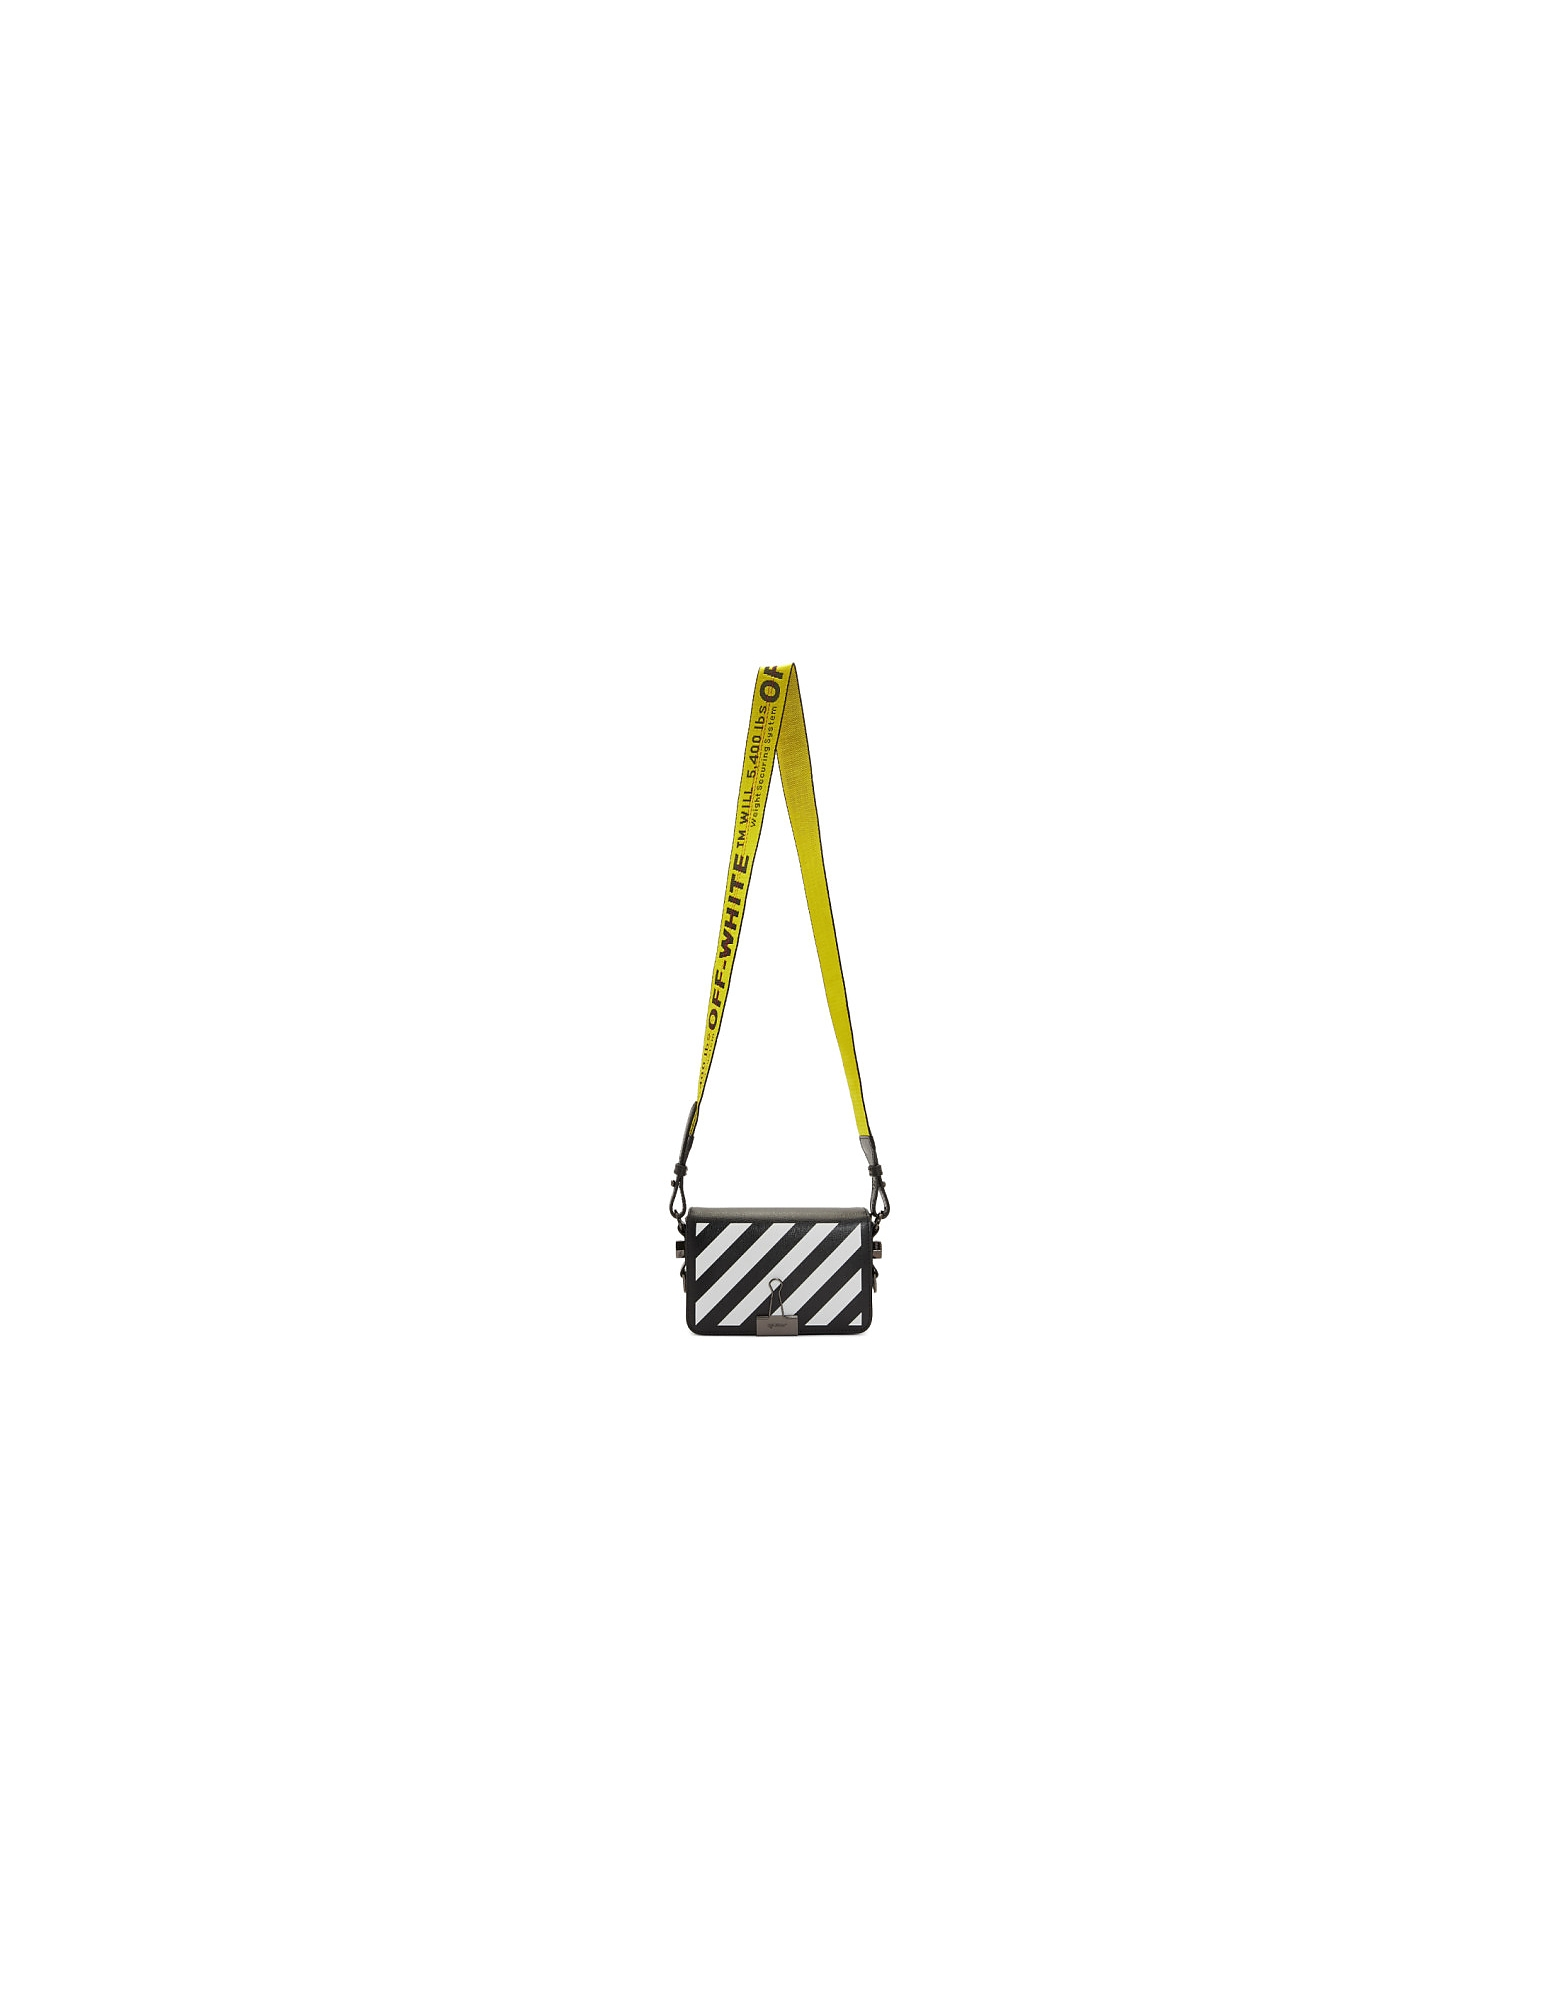 Off-White Designer Handbags, Black Diag Mini Flap Bag